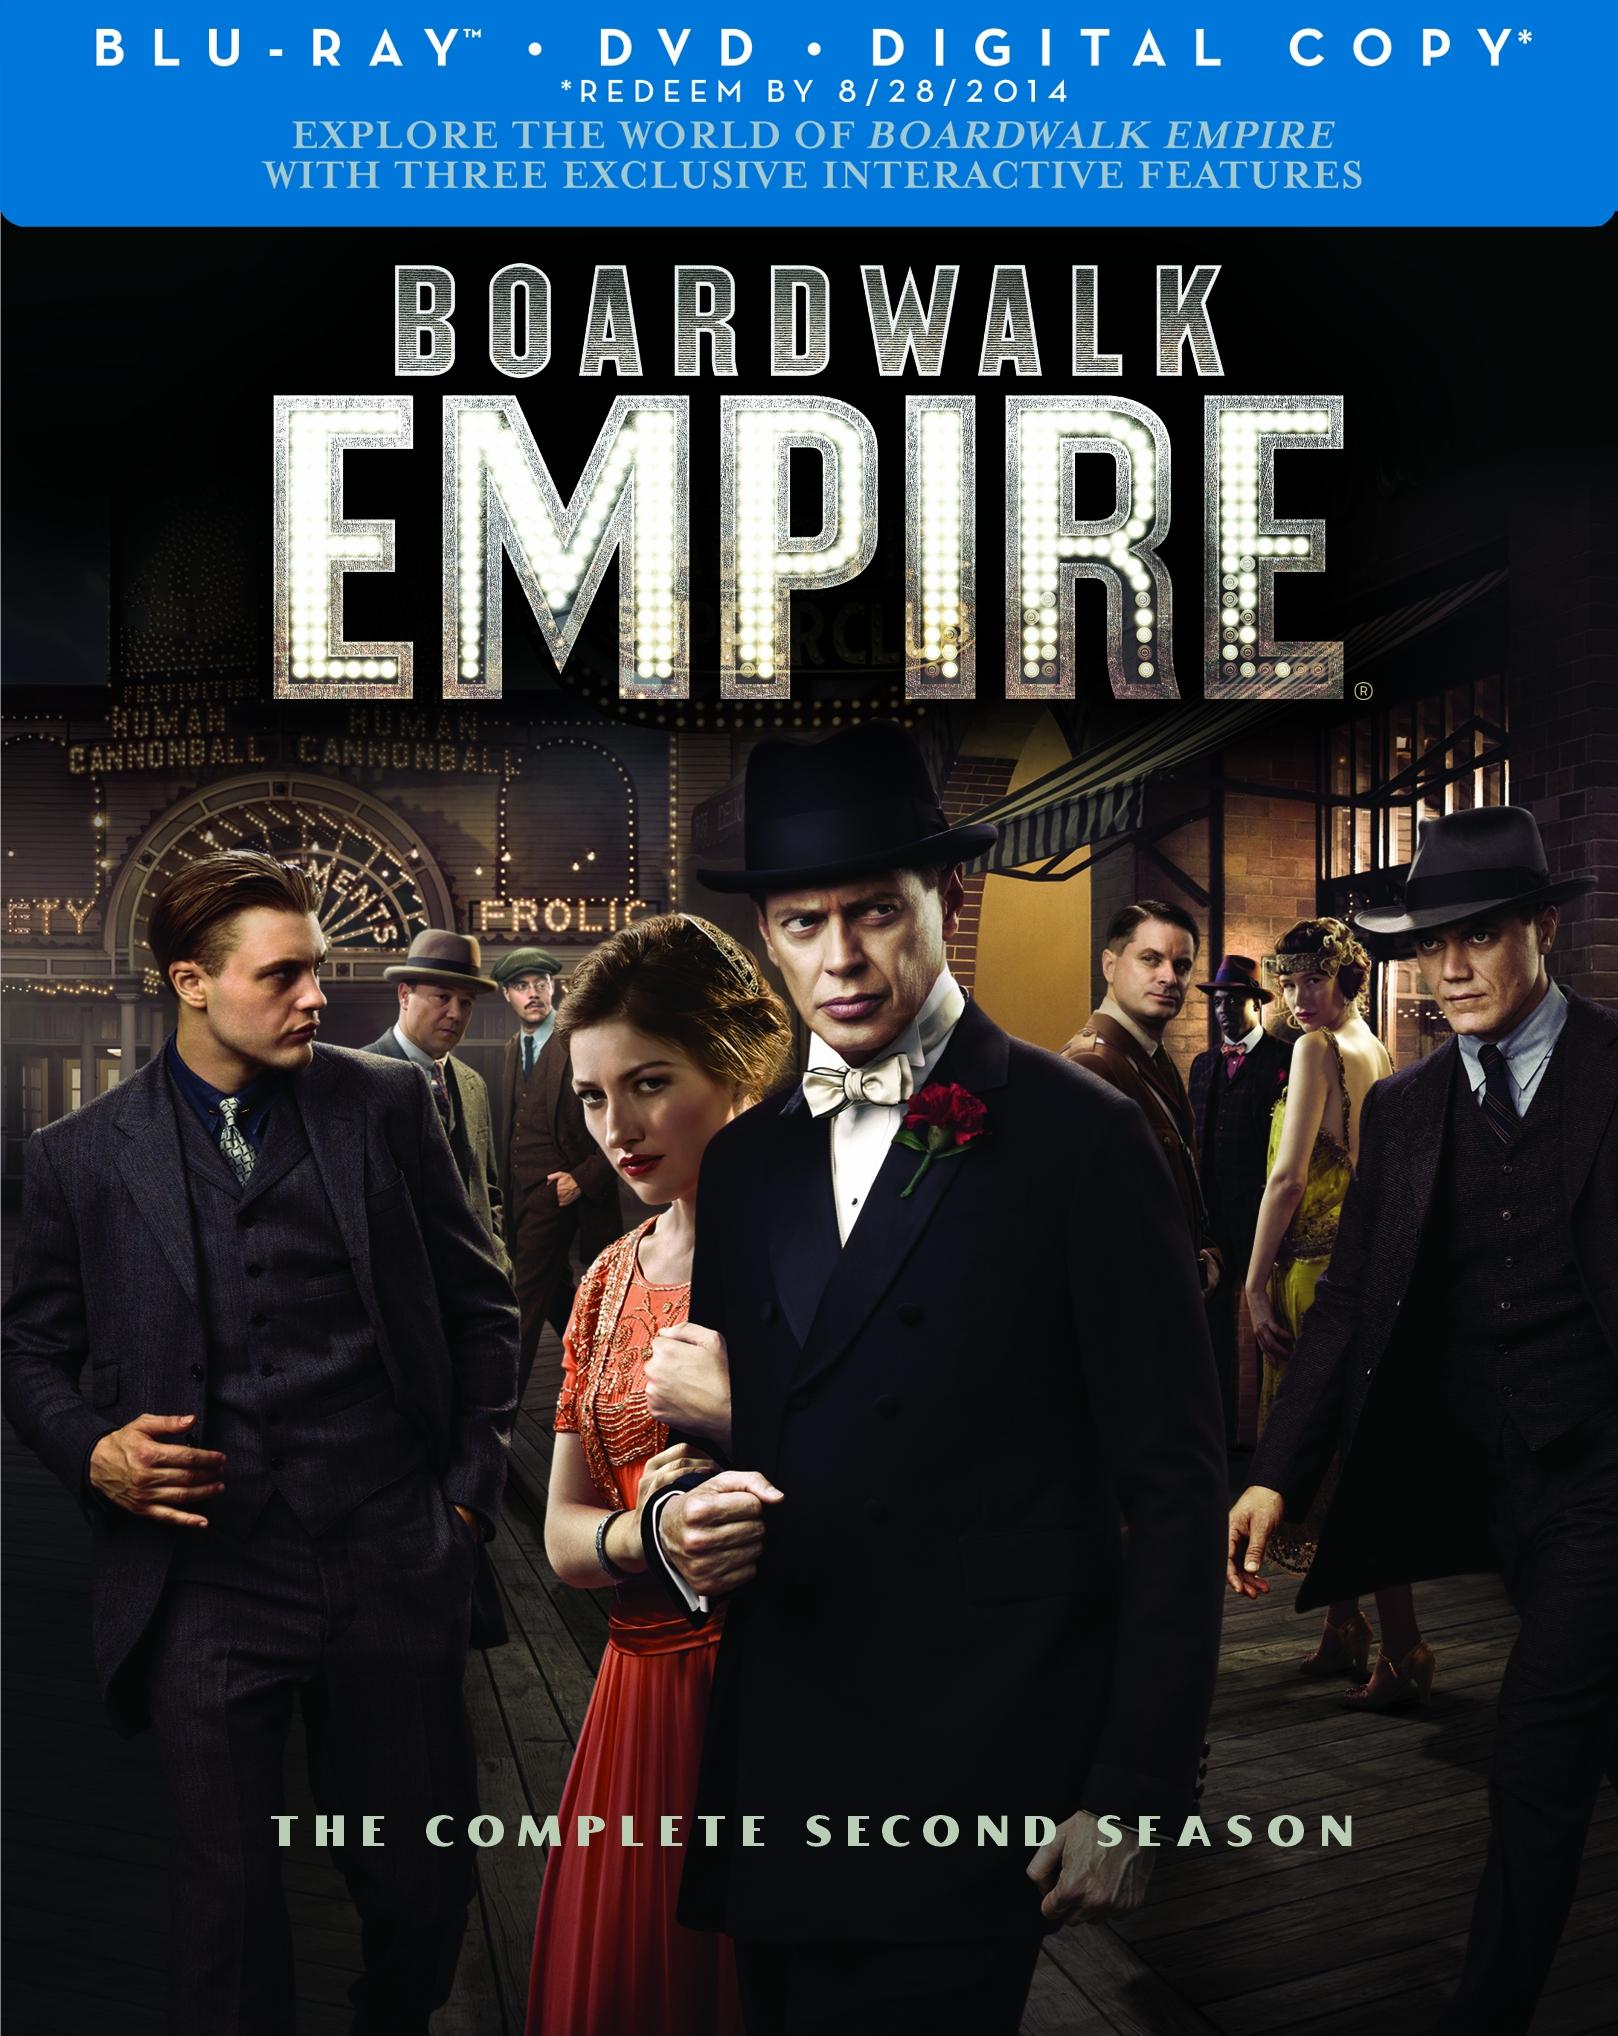 Derniers achats DVD/Blu-ray/VHS ? - Page 2 Boardwalk-empire-season-2-blu-ray